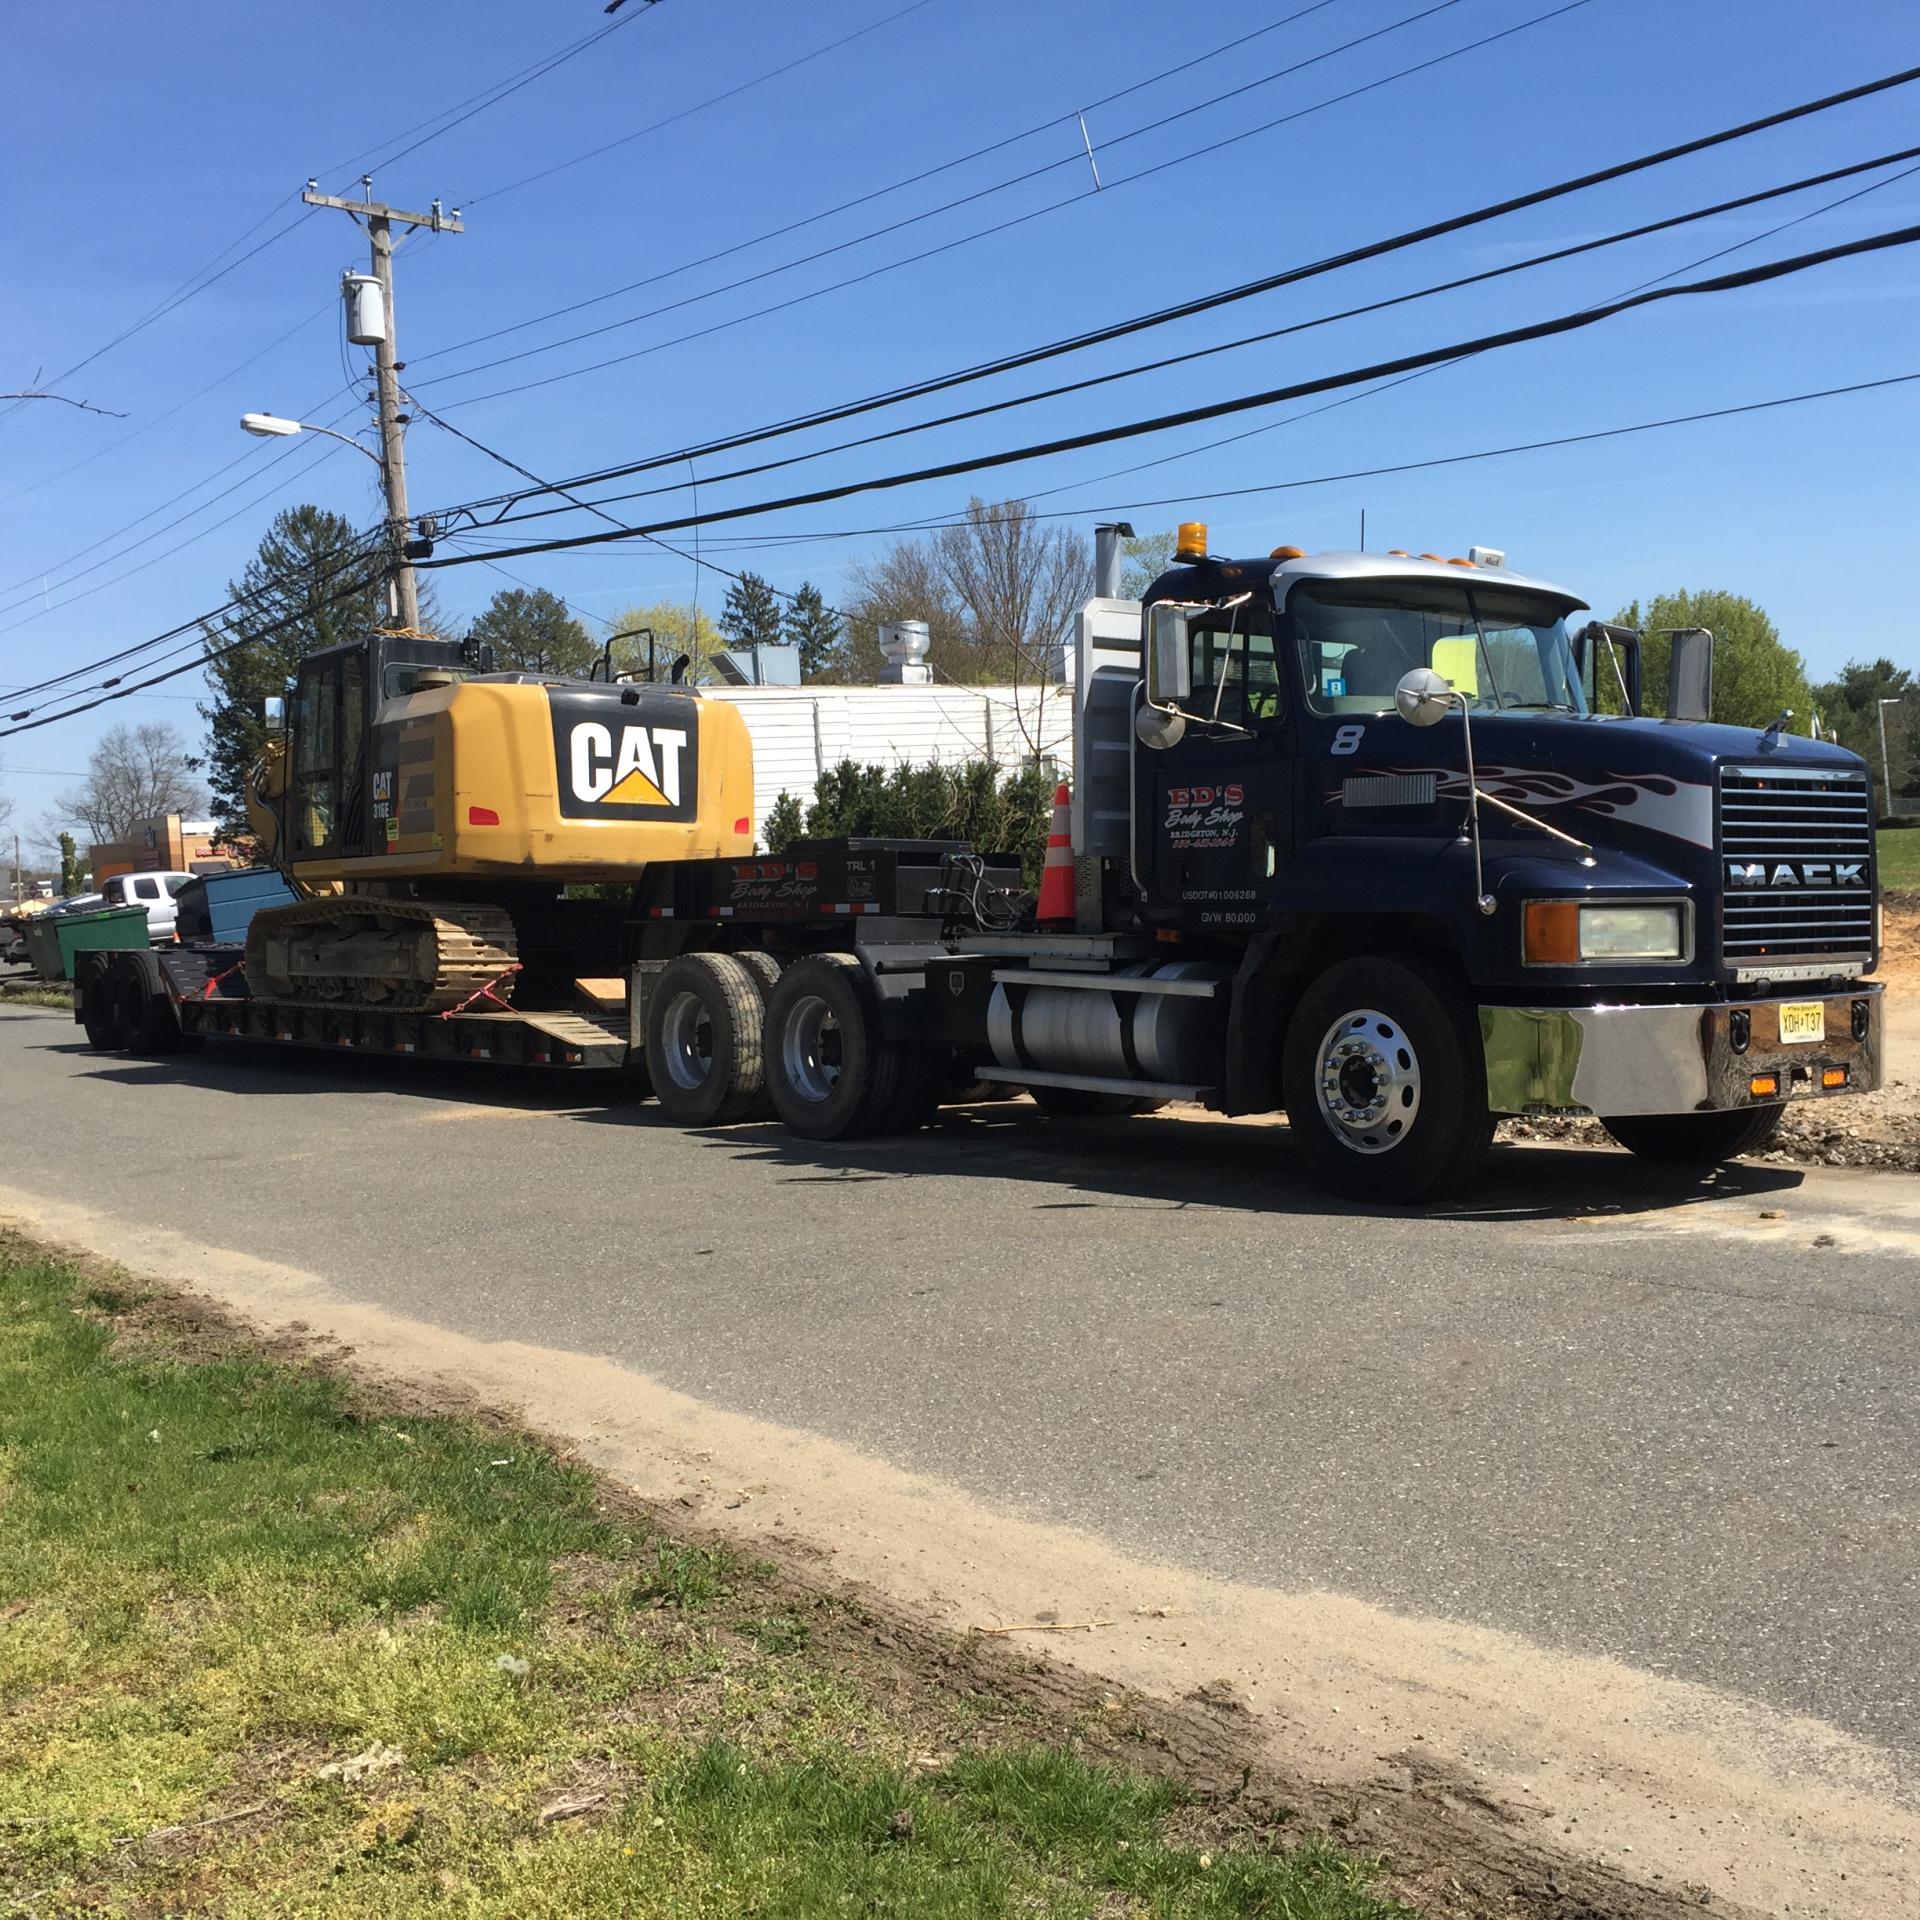 Equipment Transportation Service